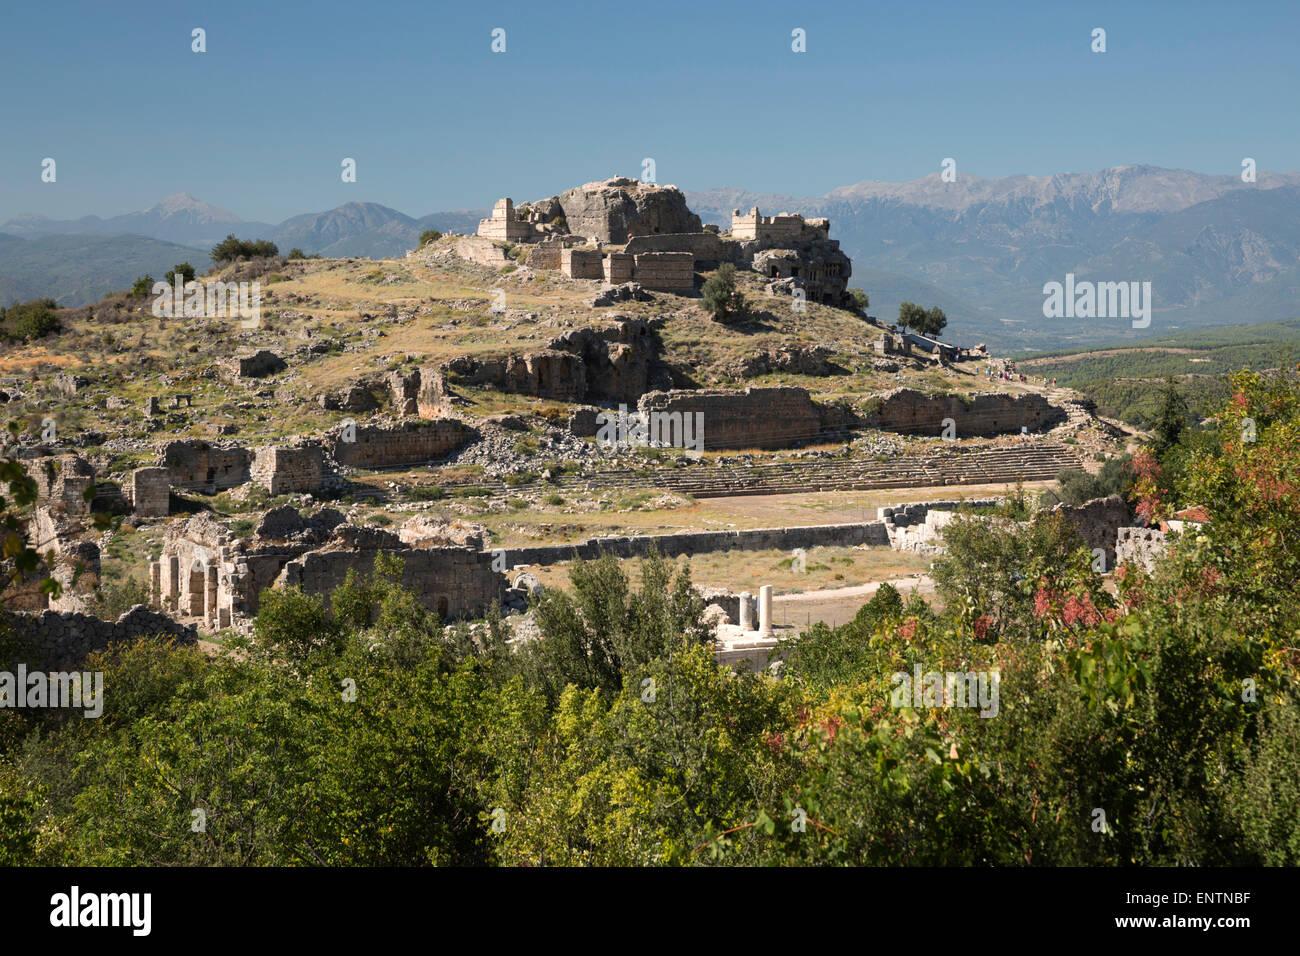 Ruined stadium and Acropolis, Tlos, near Kalkan, Lycia, Antalya Province, Mediterranean Coast, Southwest Turkey, - Stock Image